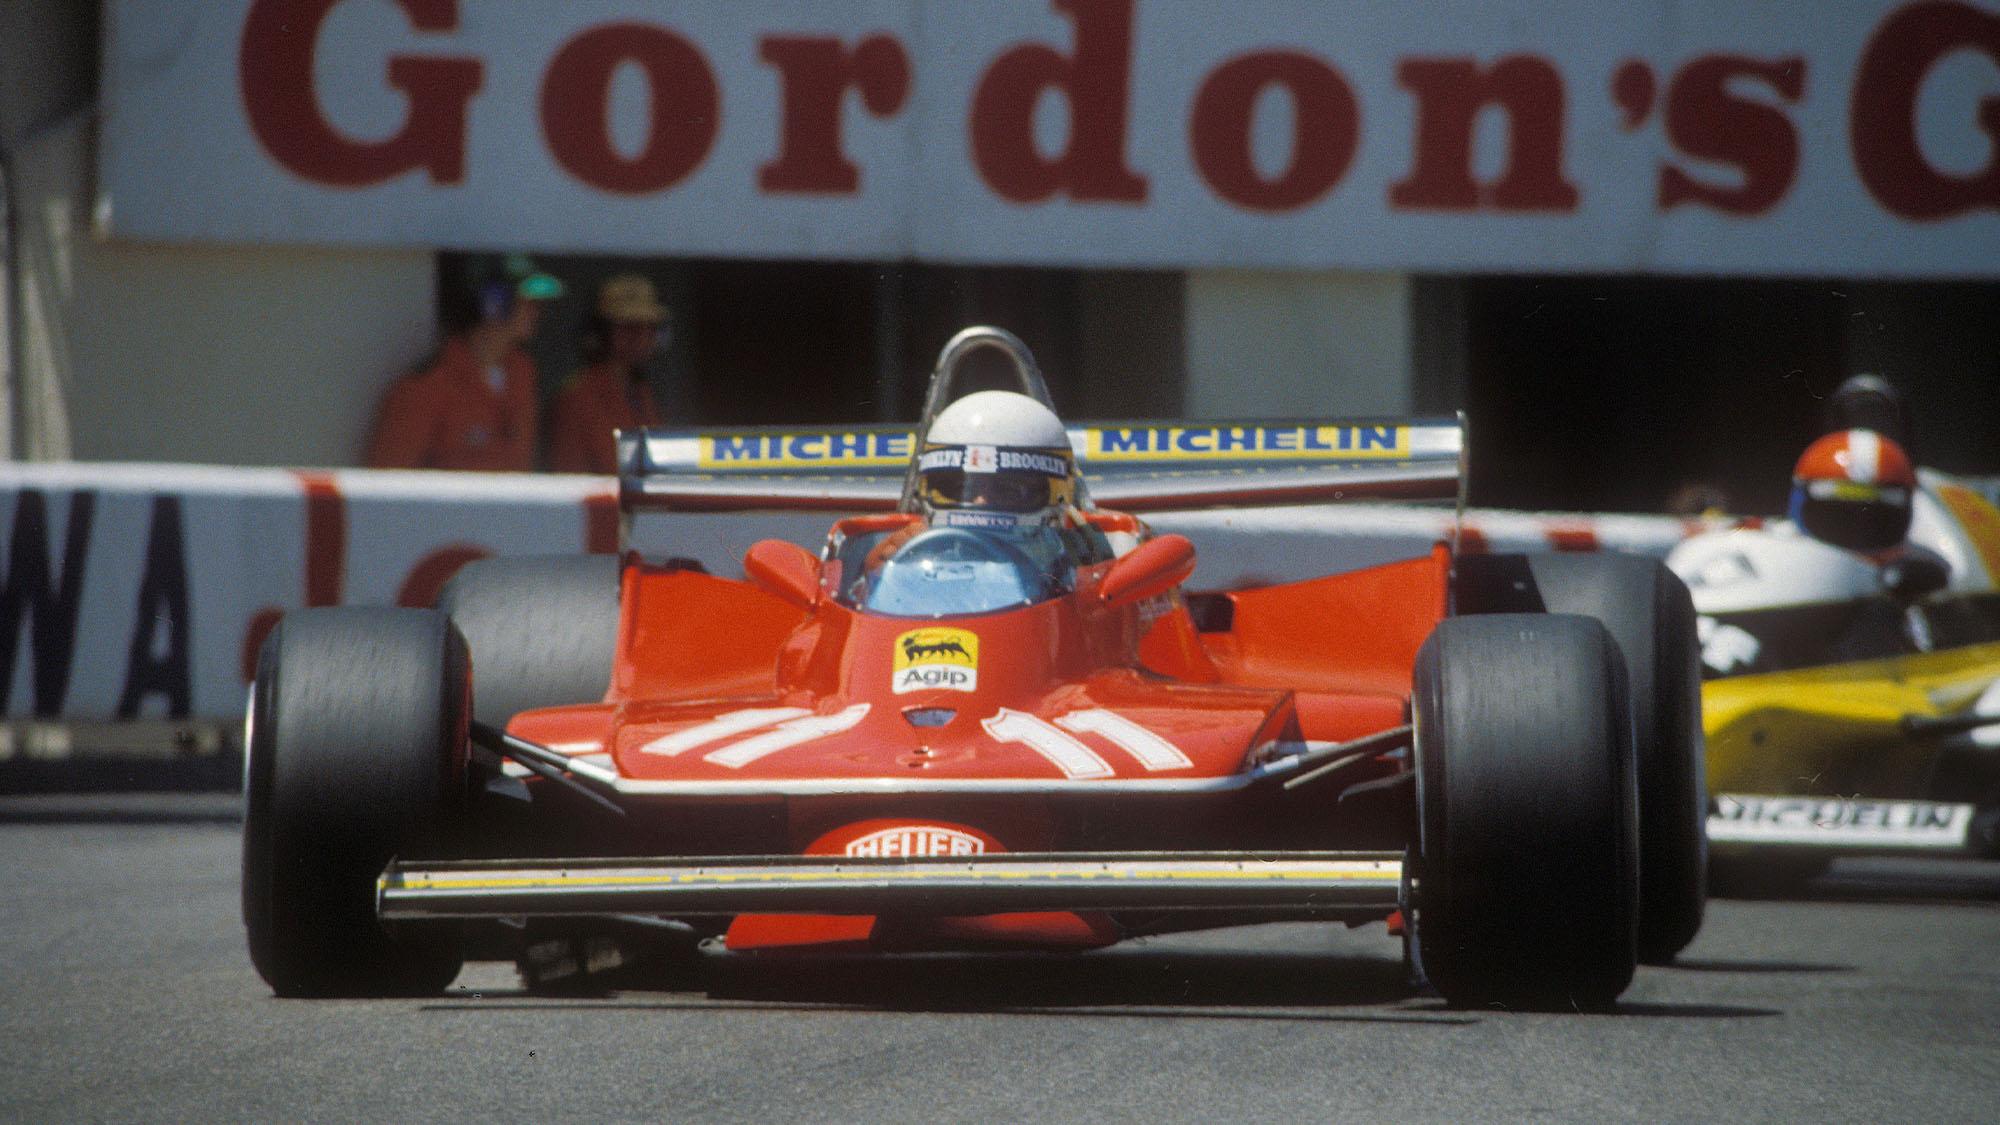 Scheckter Monaco 79